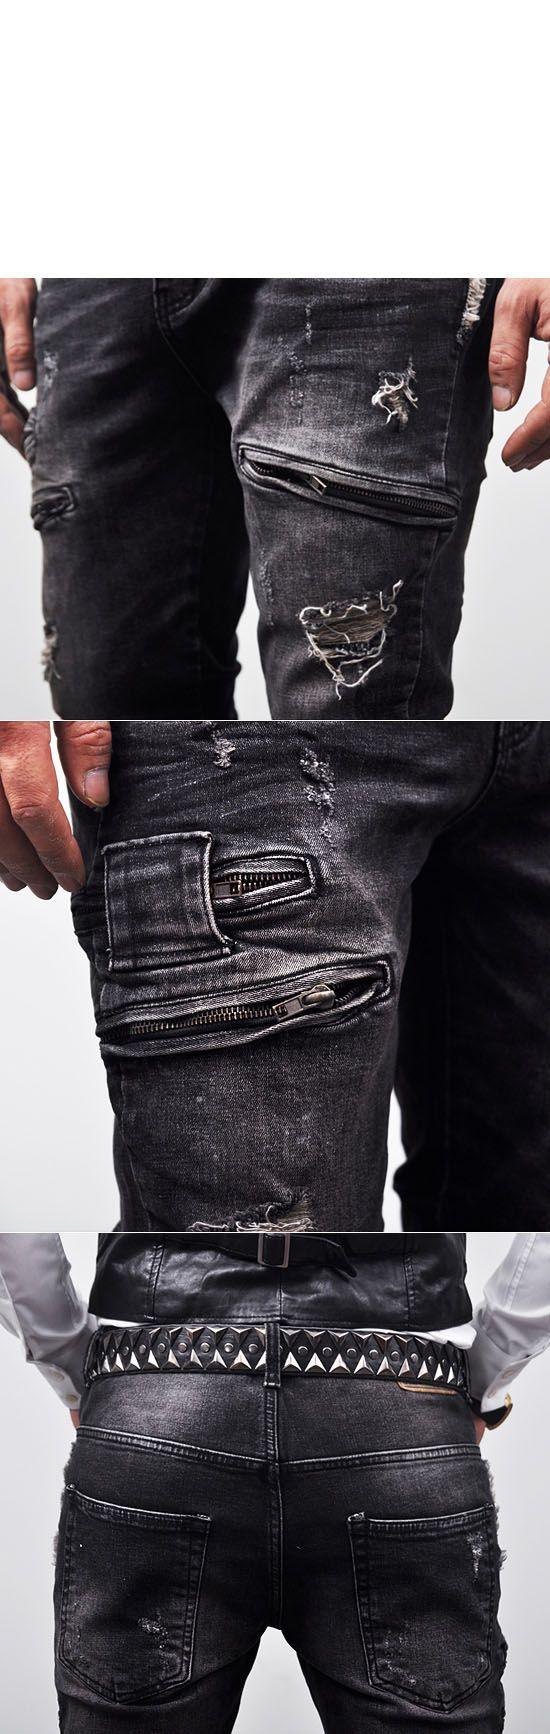 Vintage Hardcore Slim Zipper Biker-Jeans 98 - GUYLOOK